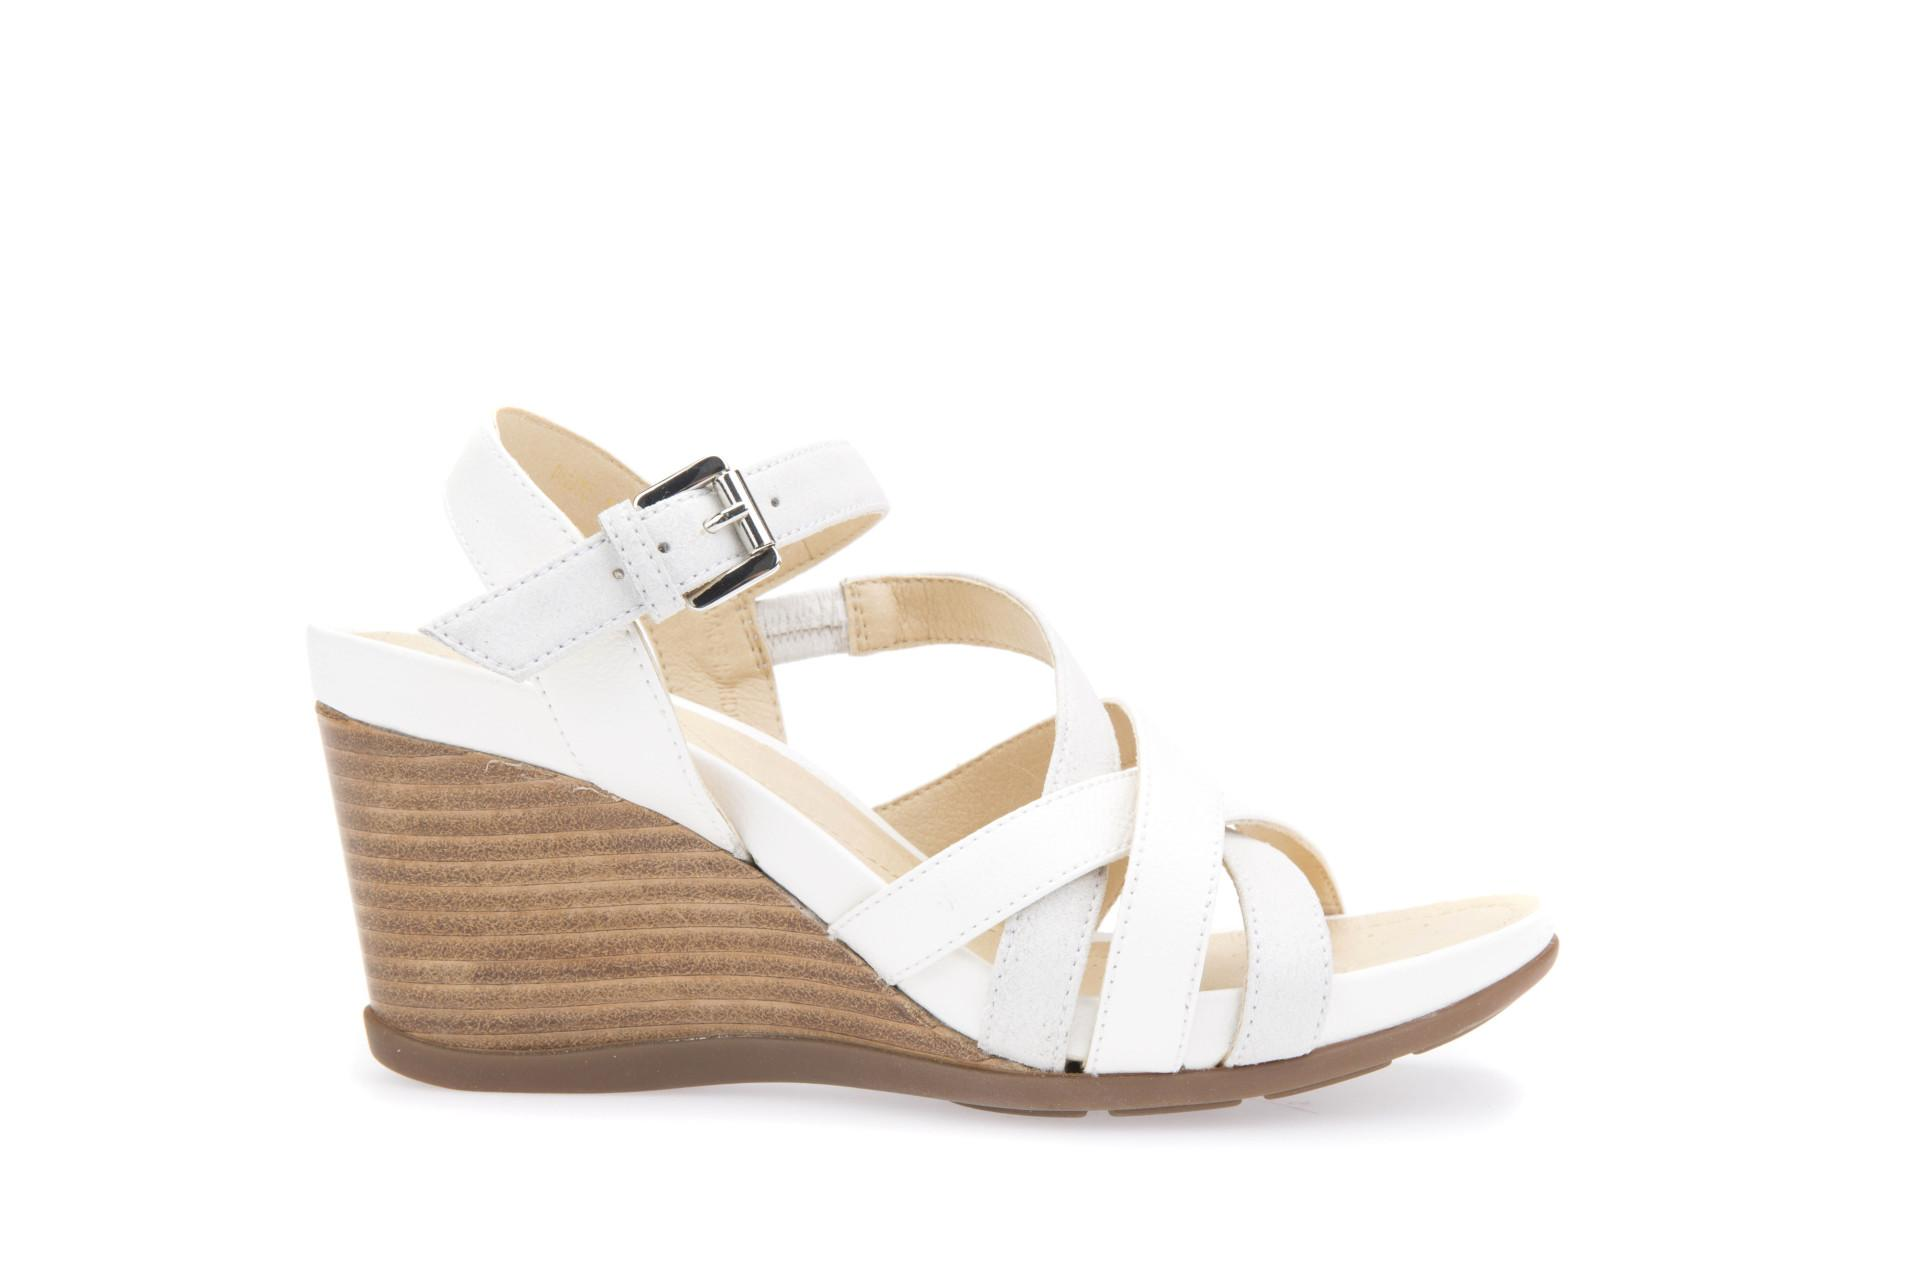 7b3ad830230 GEOX WOMEN SHOES DRESS SANDAL D DOROTHA C WHITE/PLATINUM